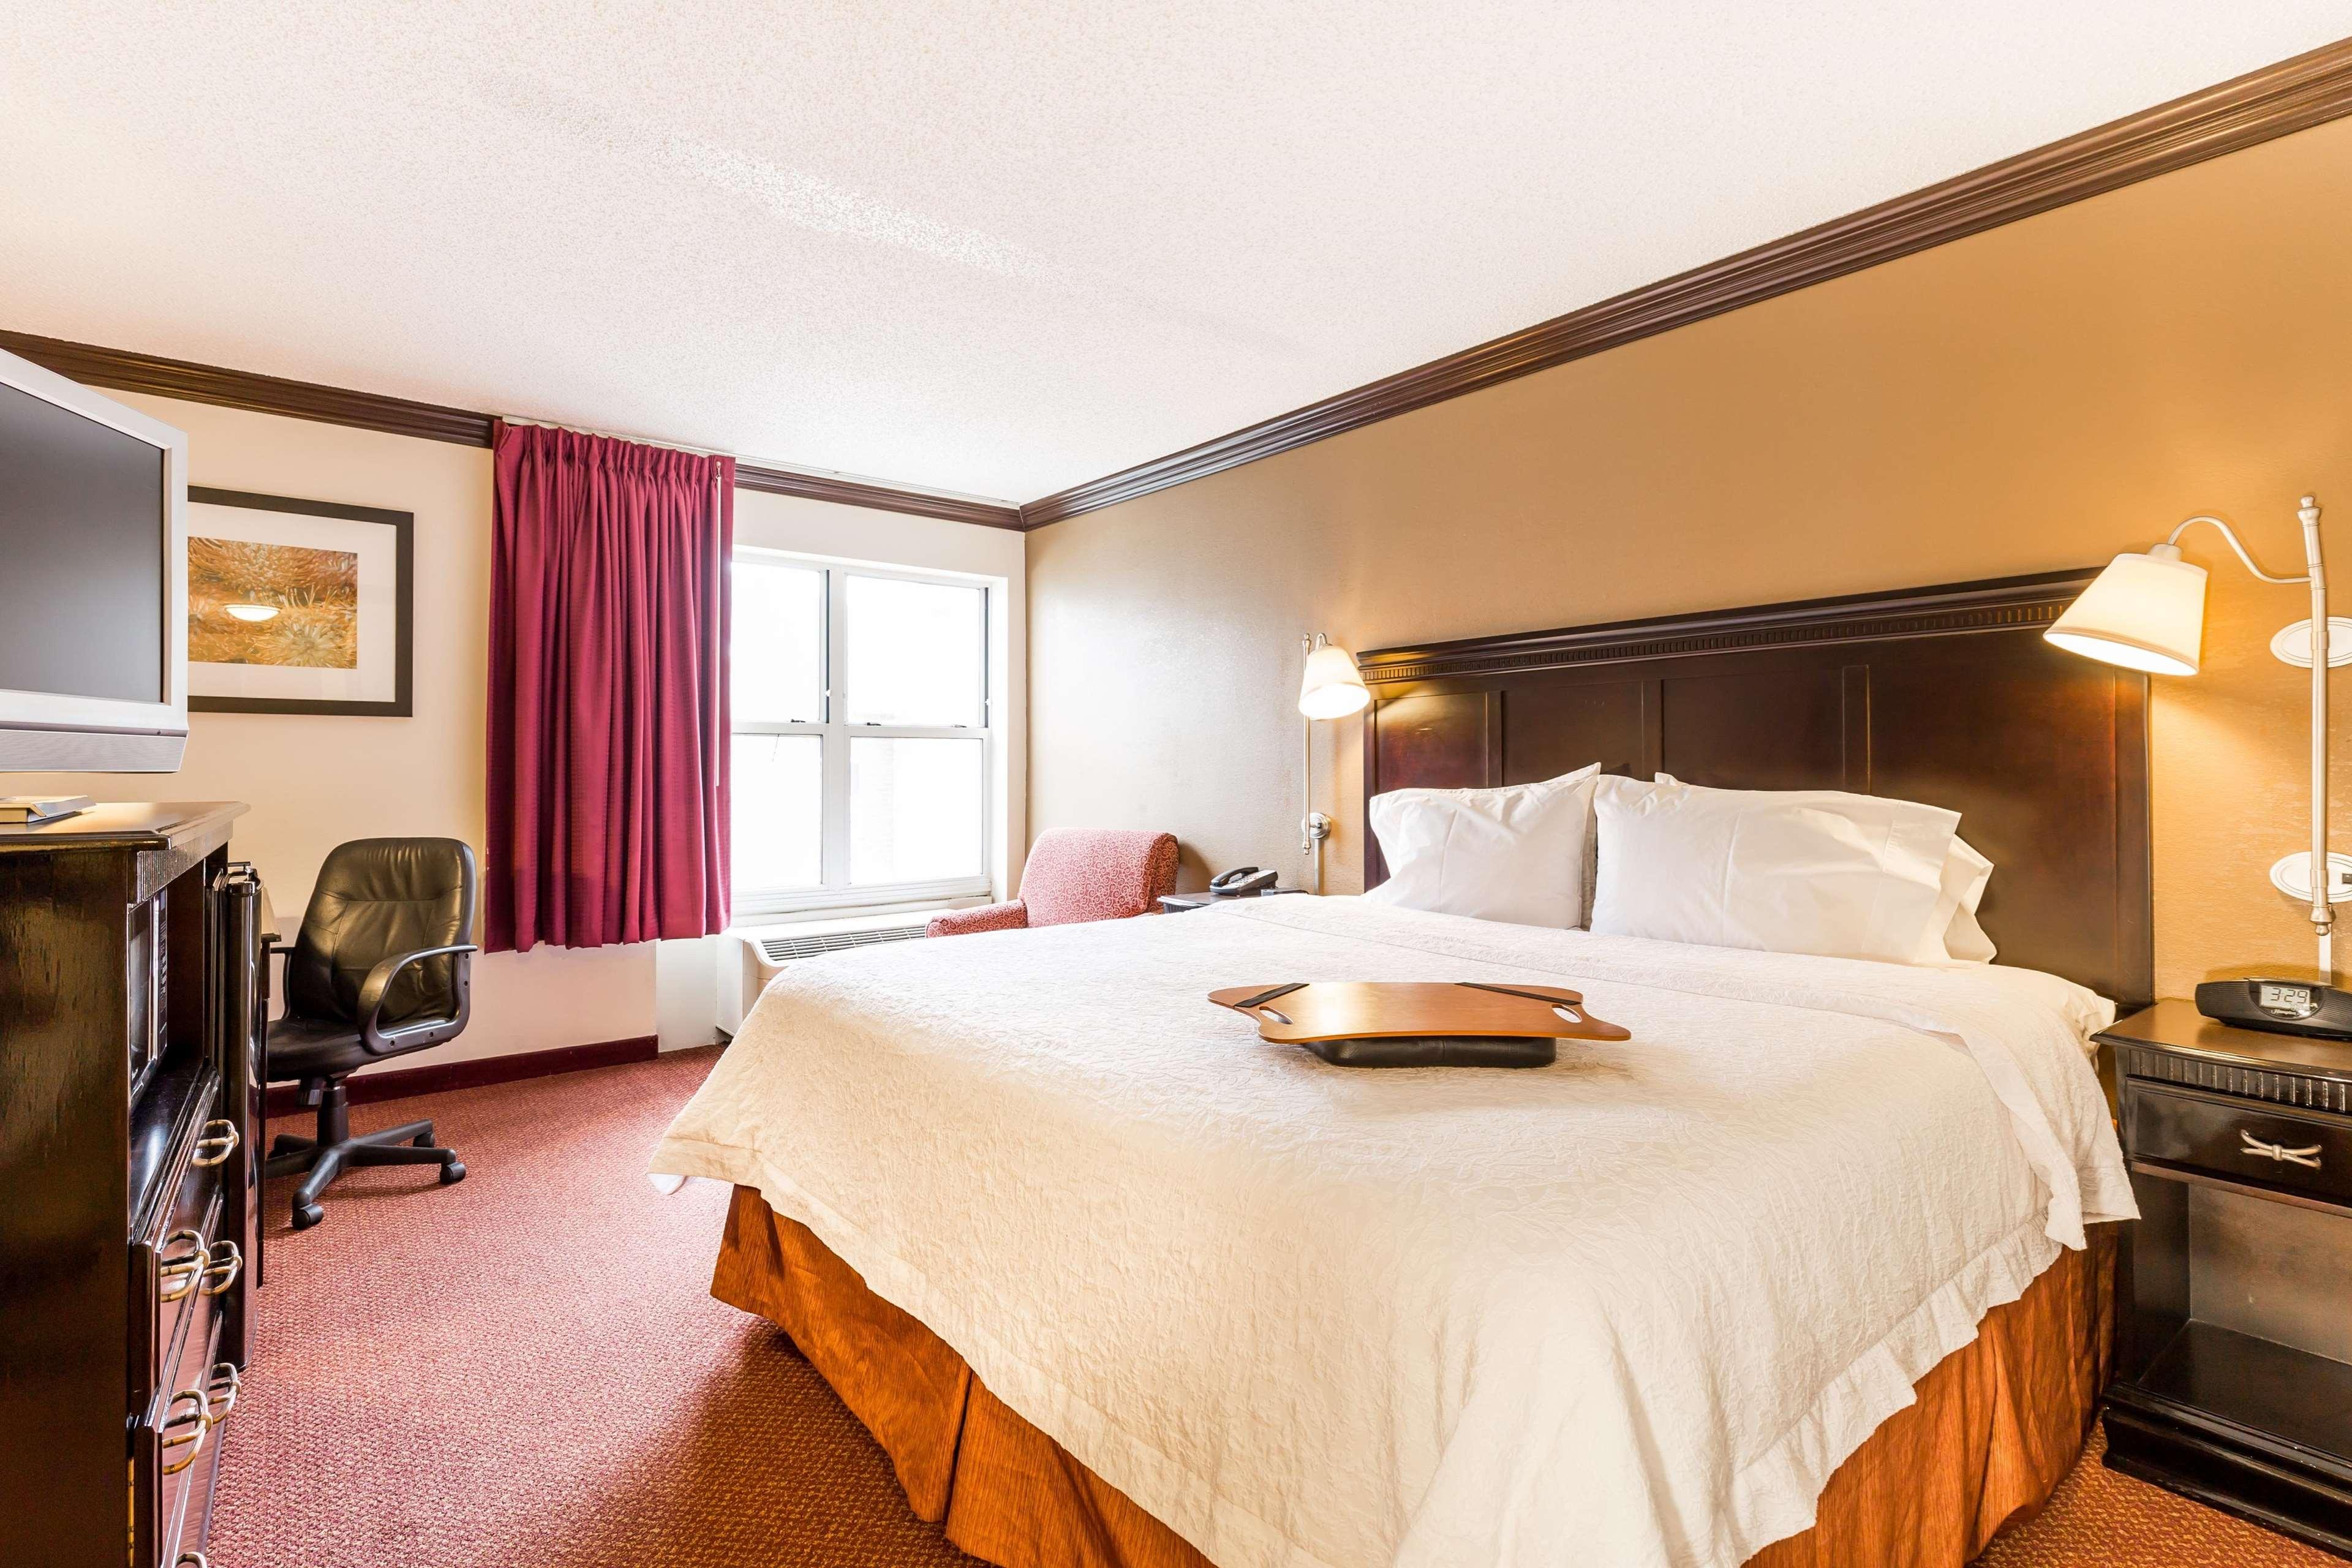 Hampton Inn & Suites Chicago/Hoffman Estates image 27